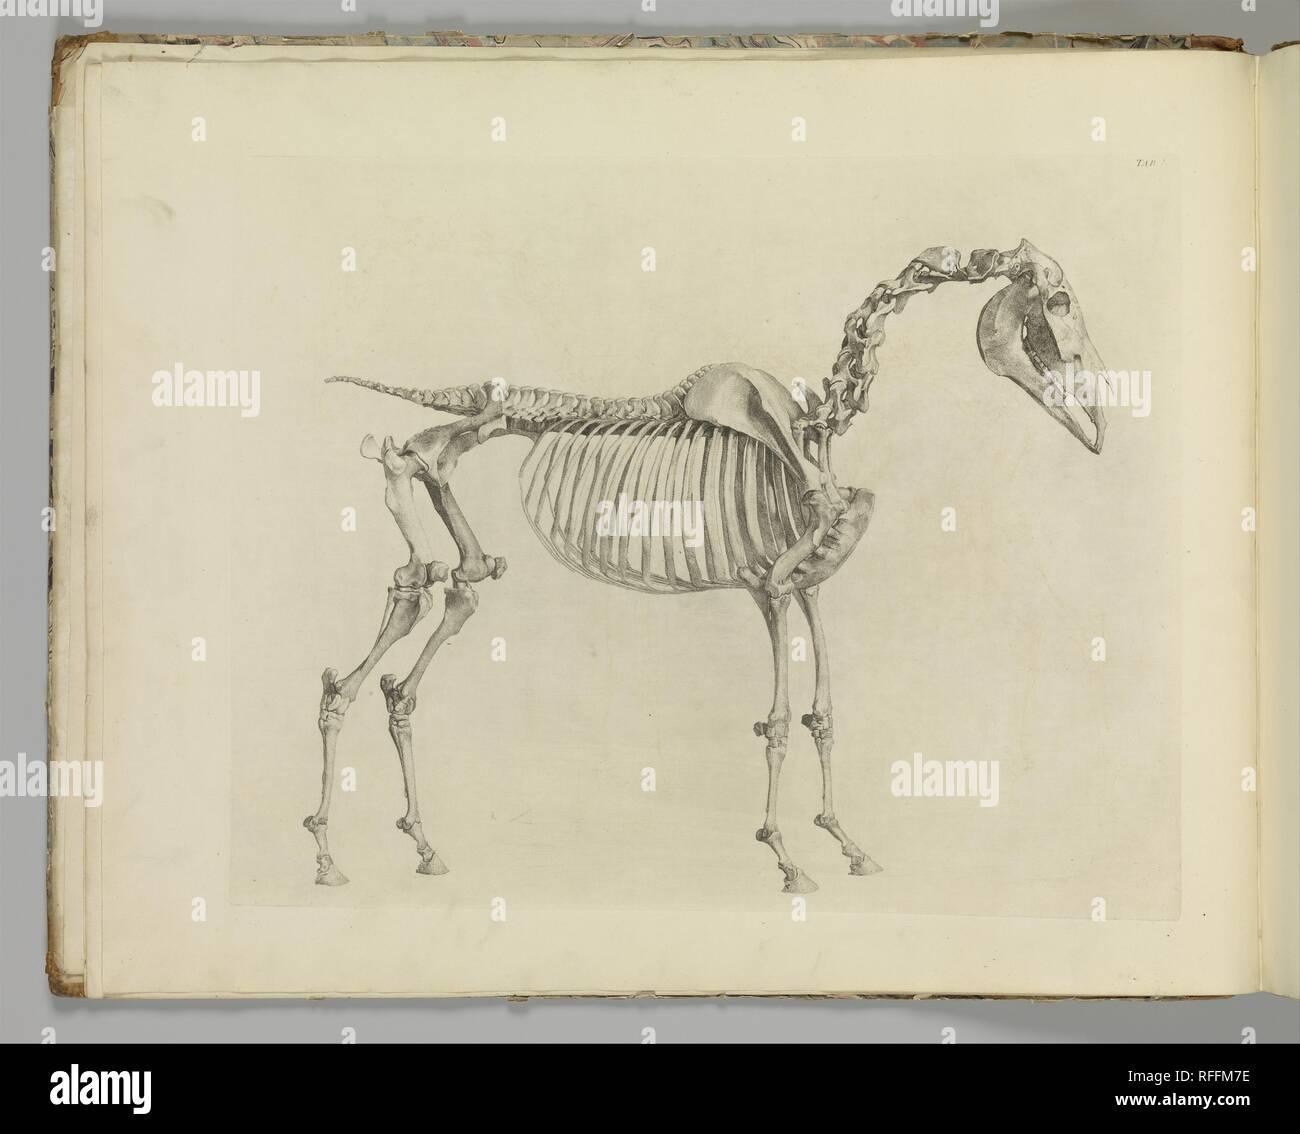 George Stubbs British Liverpool 17241806 London The Anatomy Of